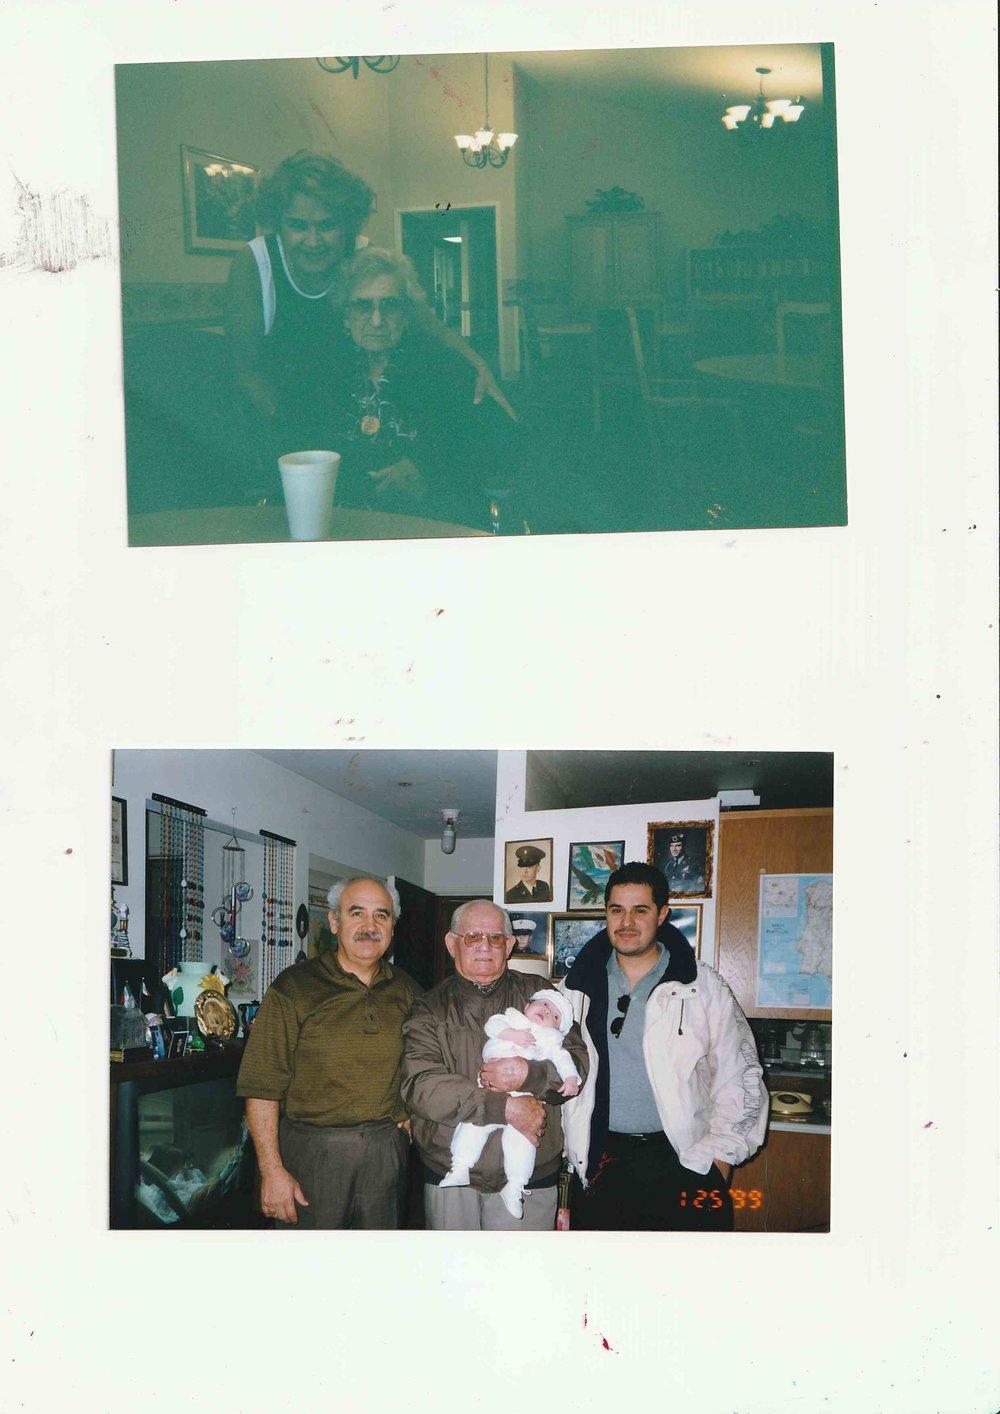 IMG_1996.JPG